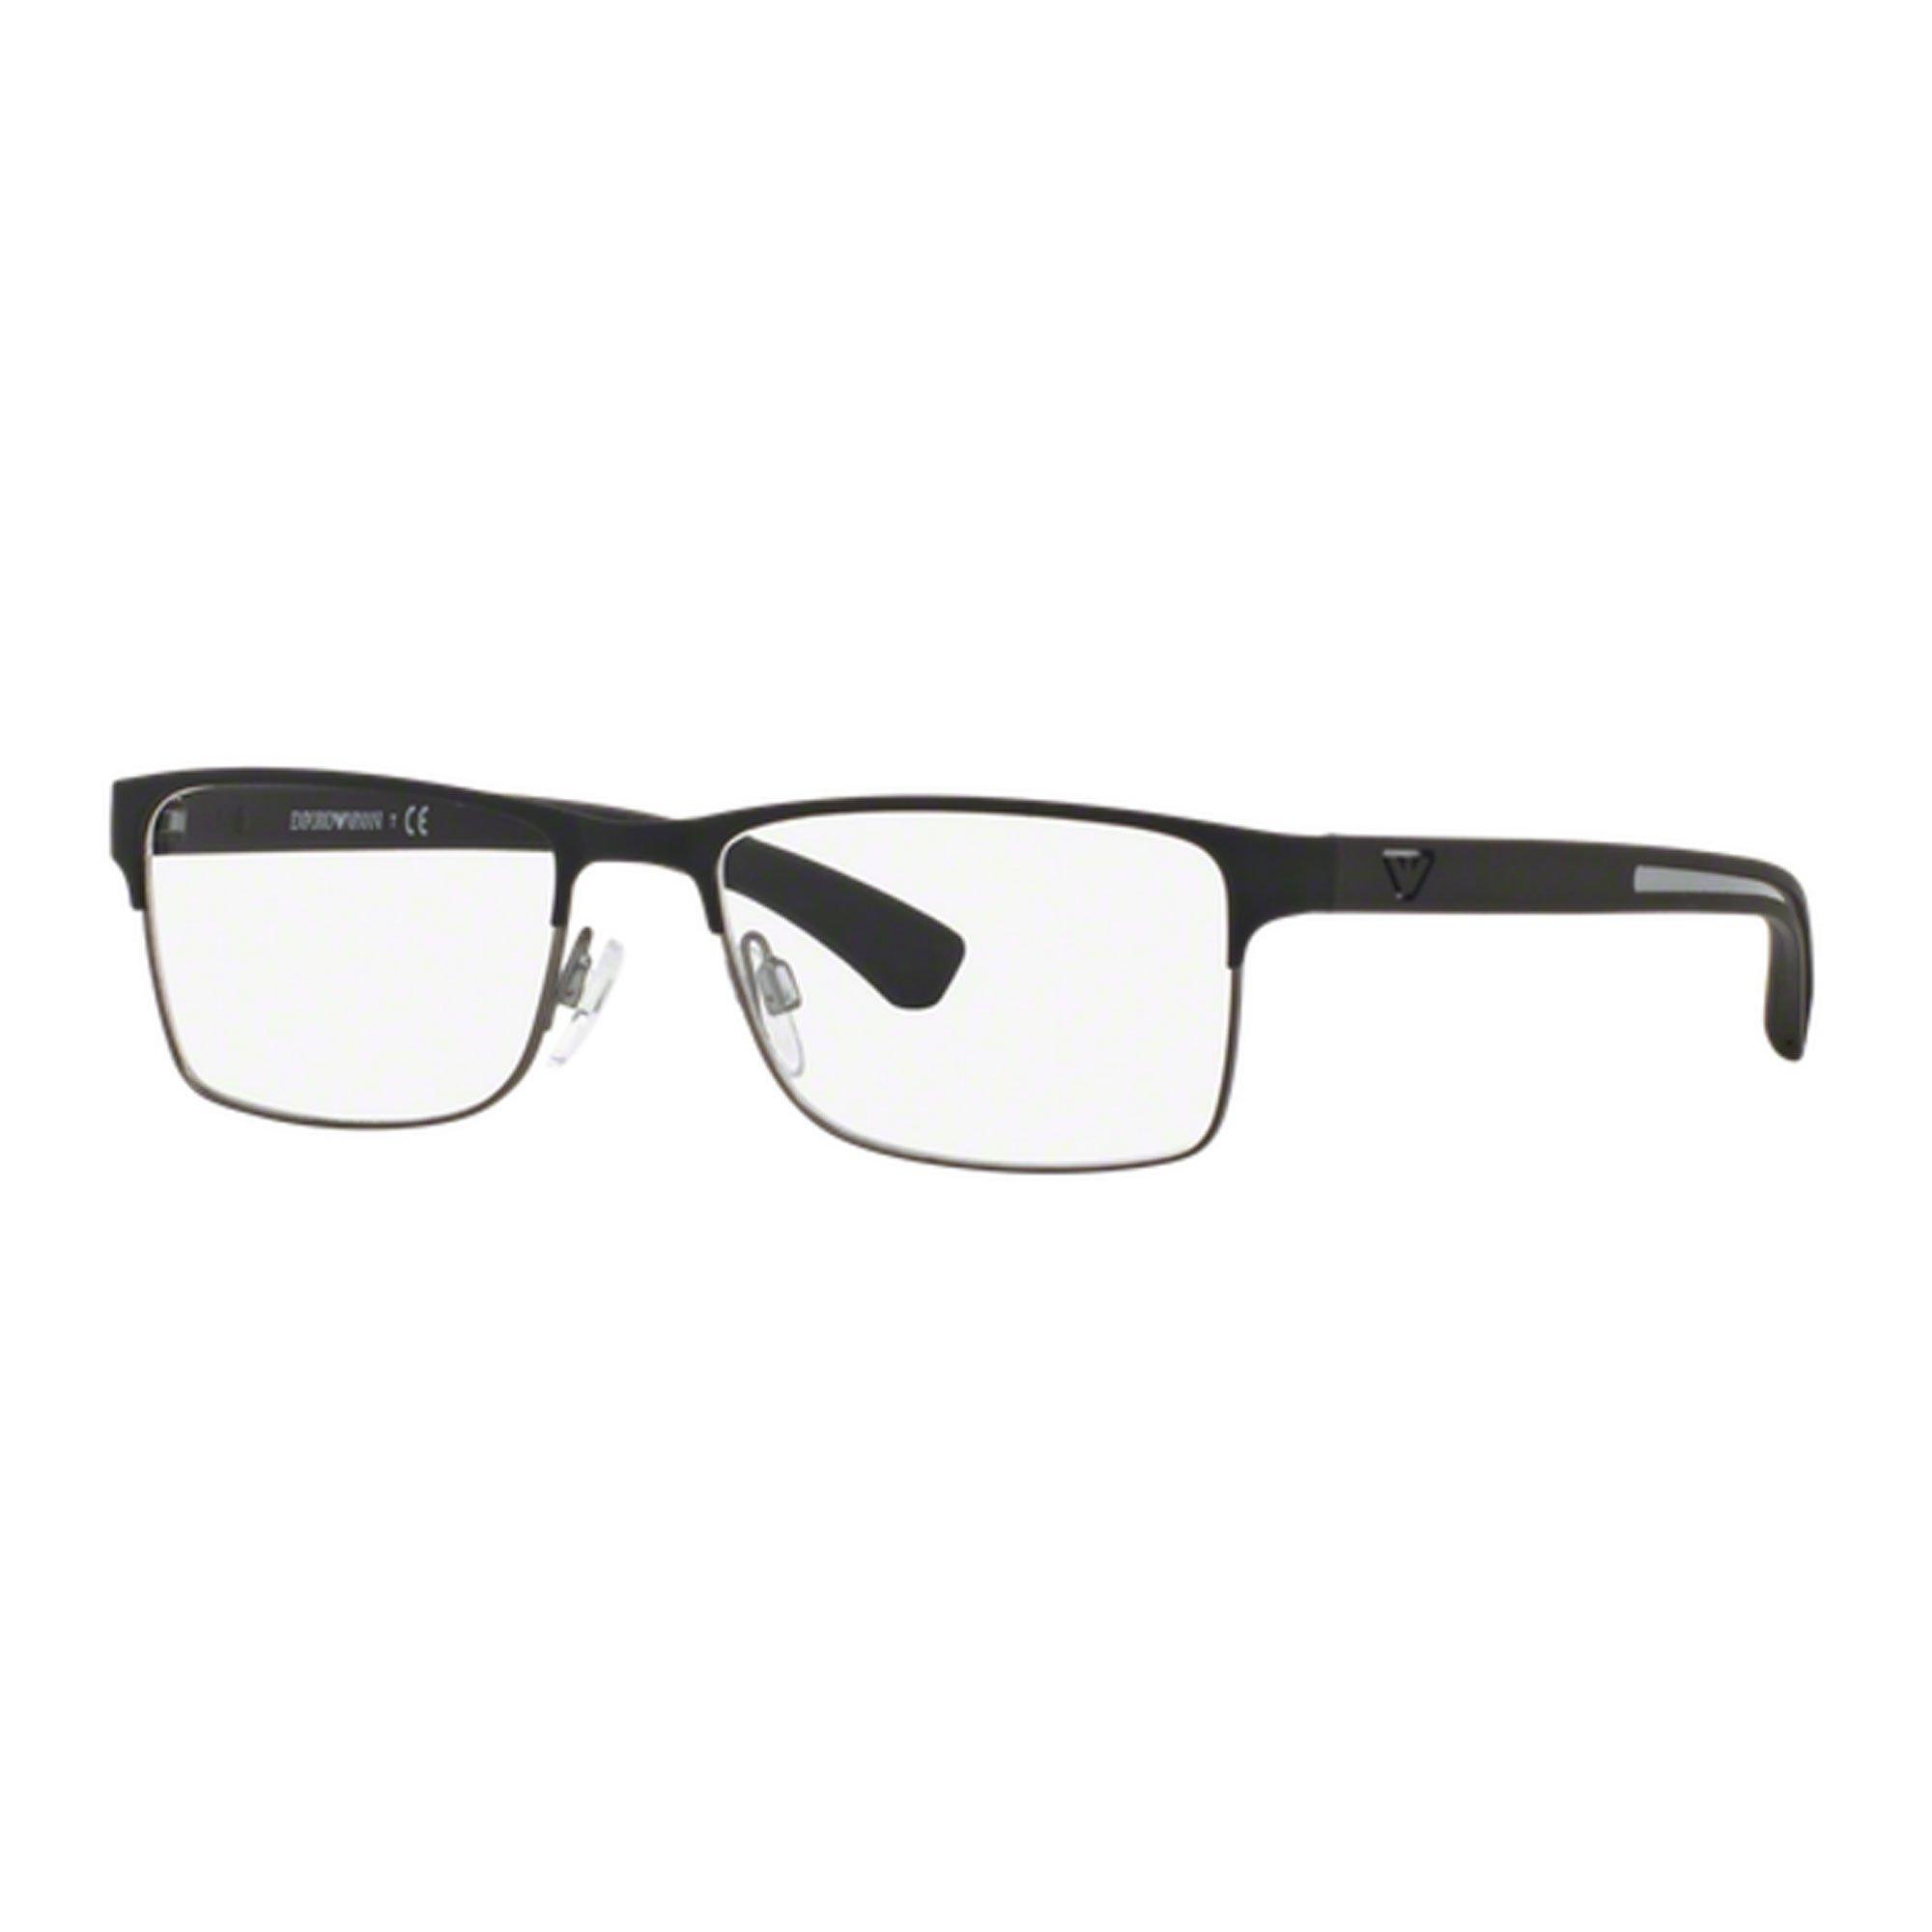 Emporio Armani EA1052 3094 occhiali da vista nero black eyeglasses sehbrille man qwMvq9V